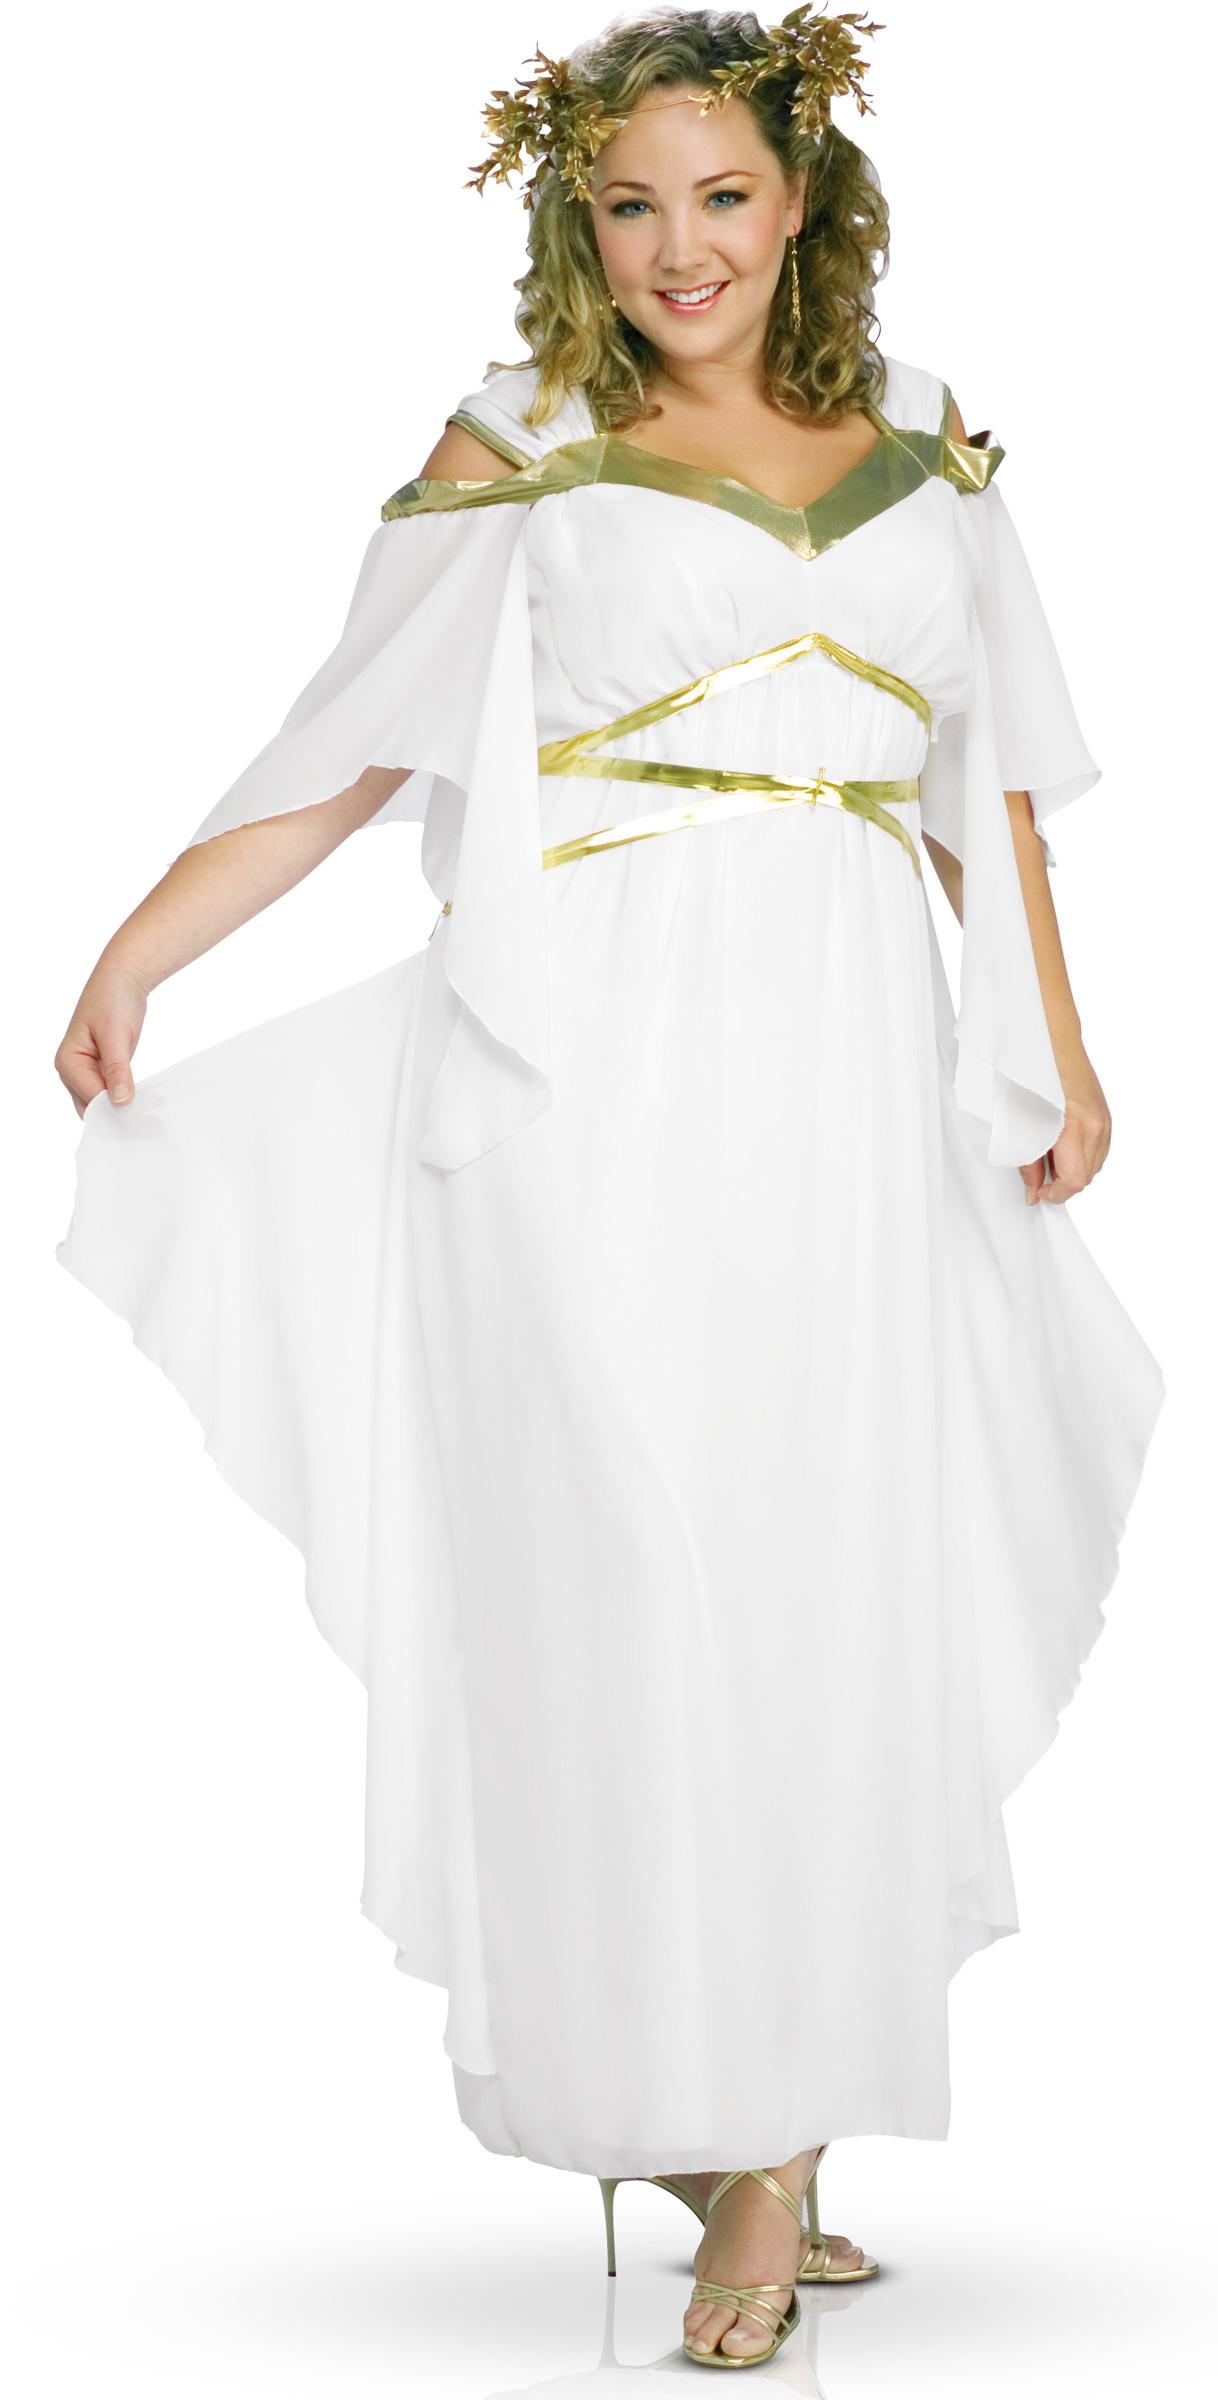 romeinse godin tuniek voor dames volwassenen kostuums en goedkope carnavalskleding vegaoo. Black Bedroom Furniture Sets. Home Design Ideas